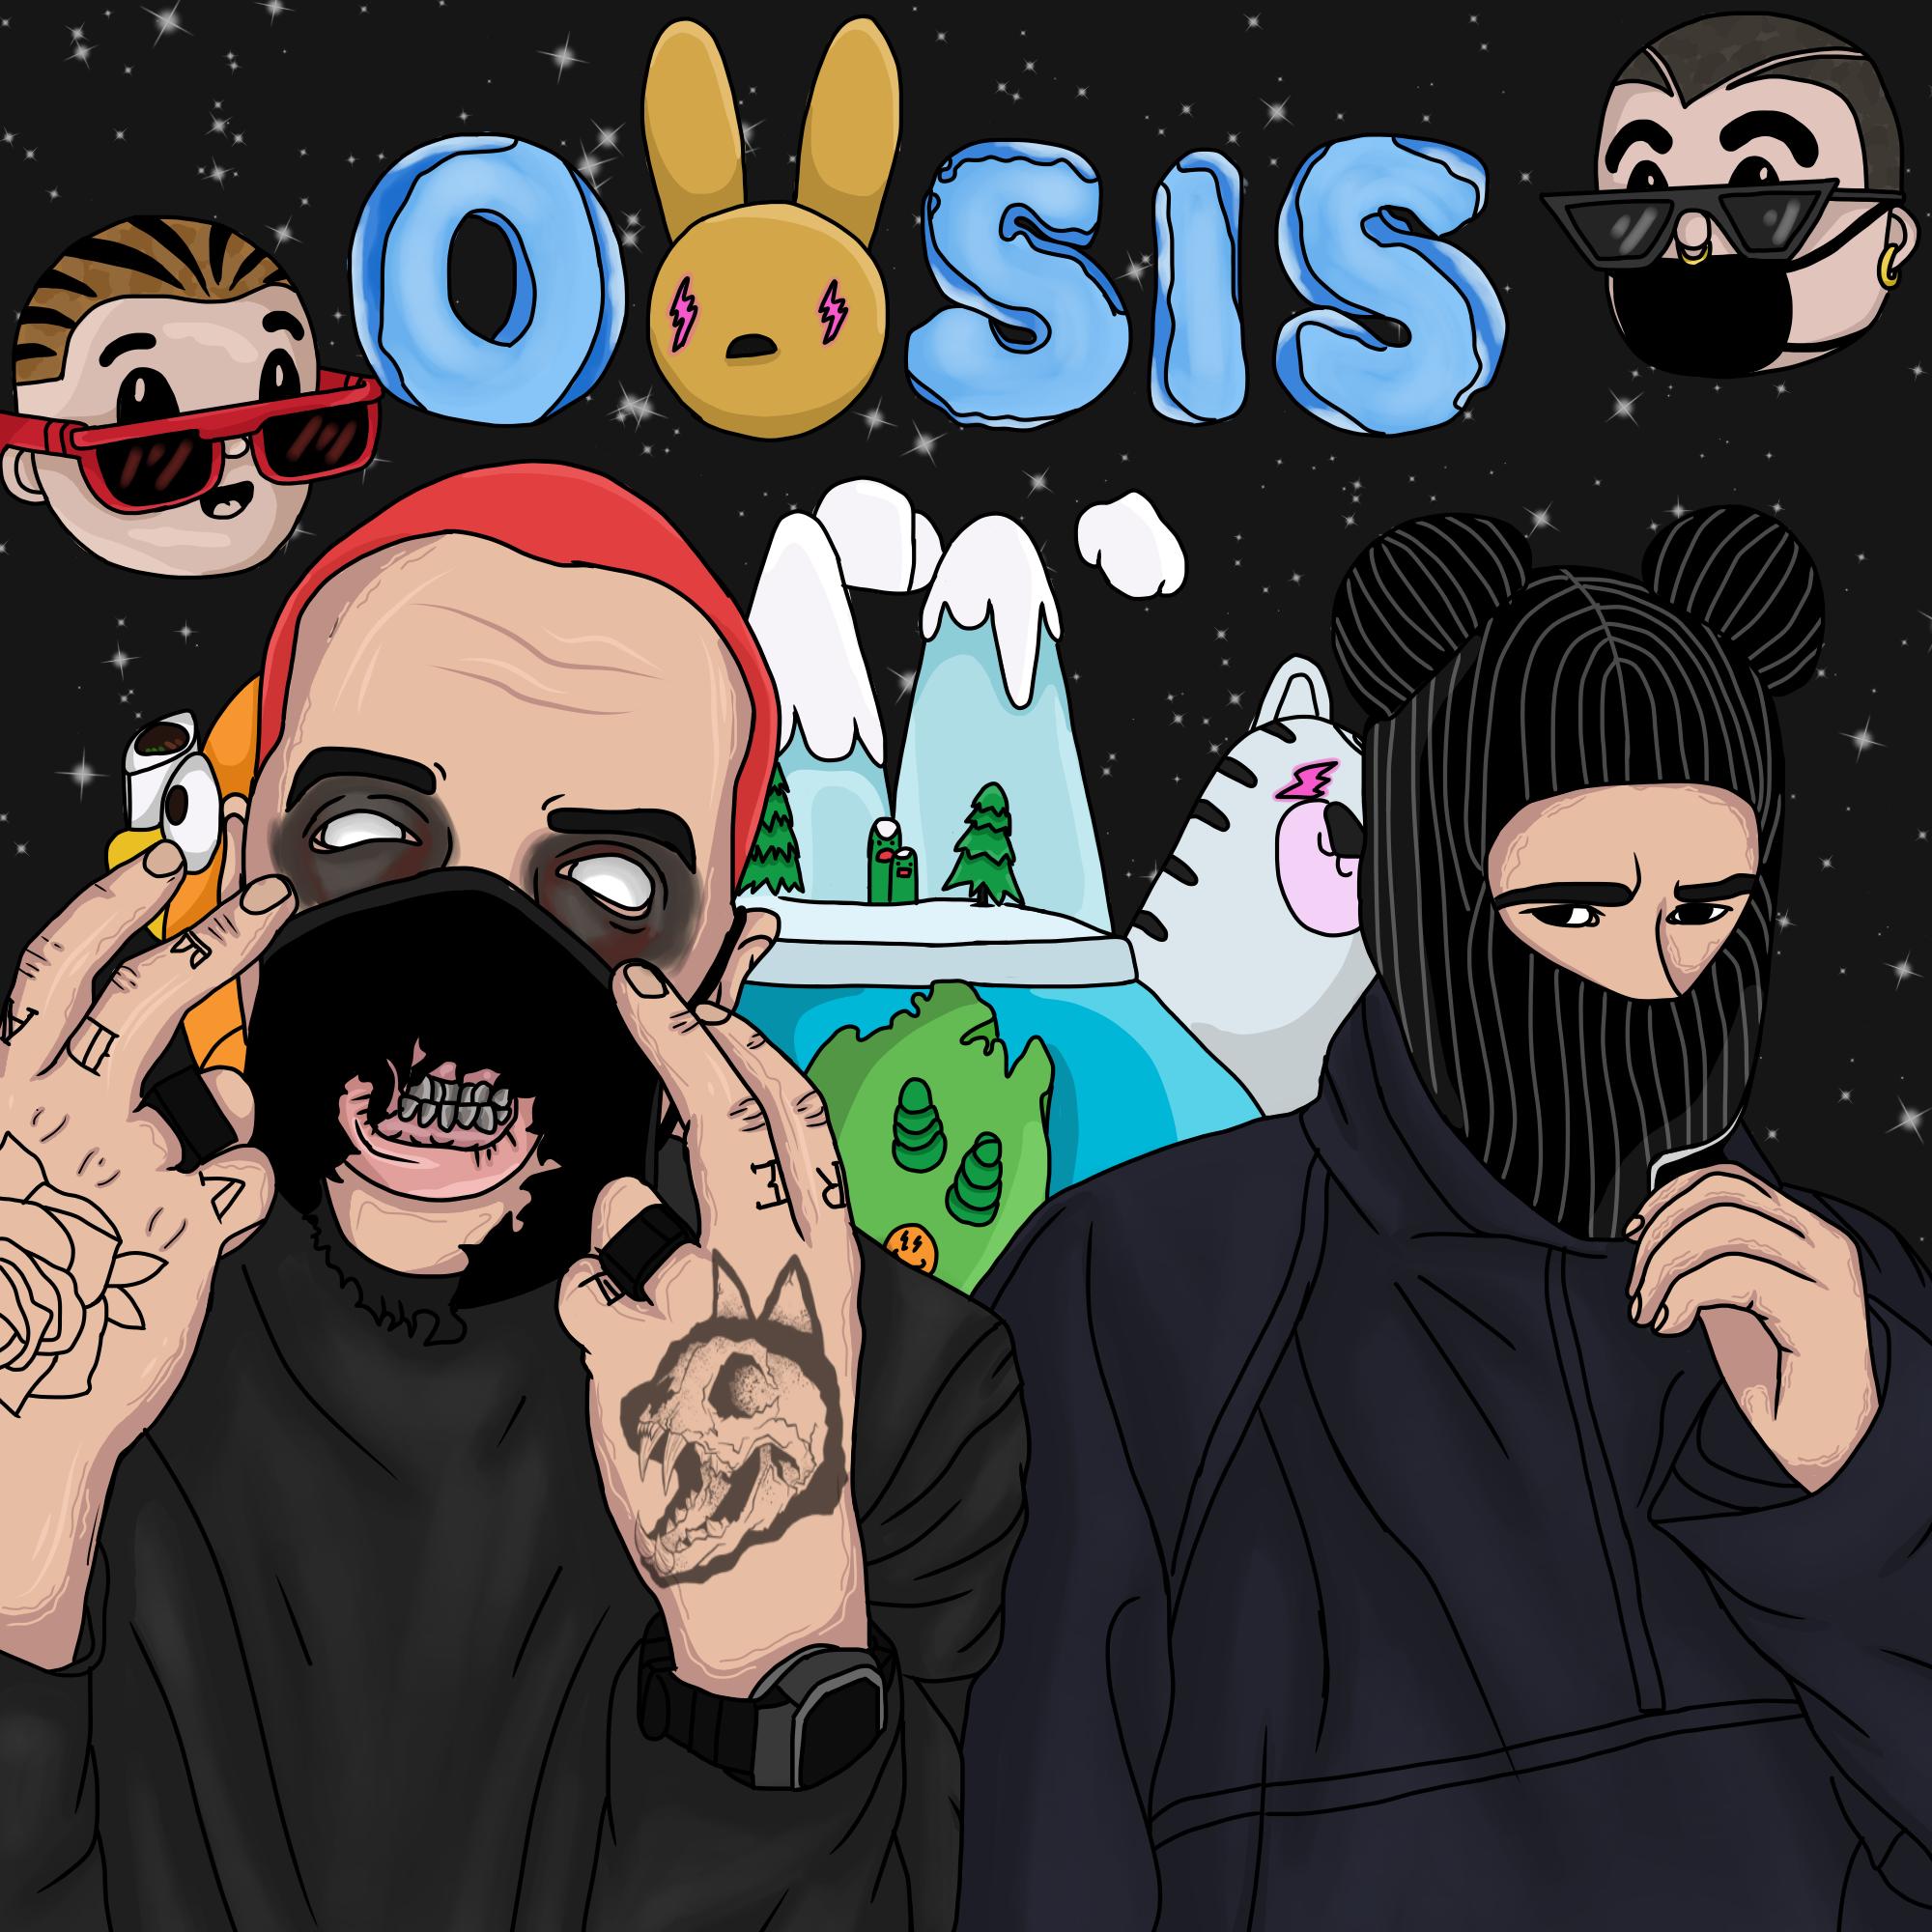 OASIS bad bunny x j balvin Bunny wallpaper, Iphone